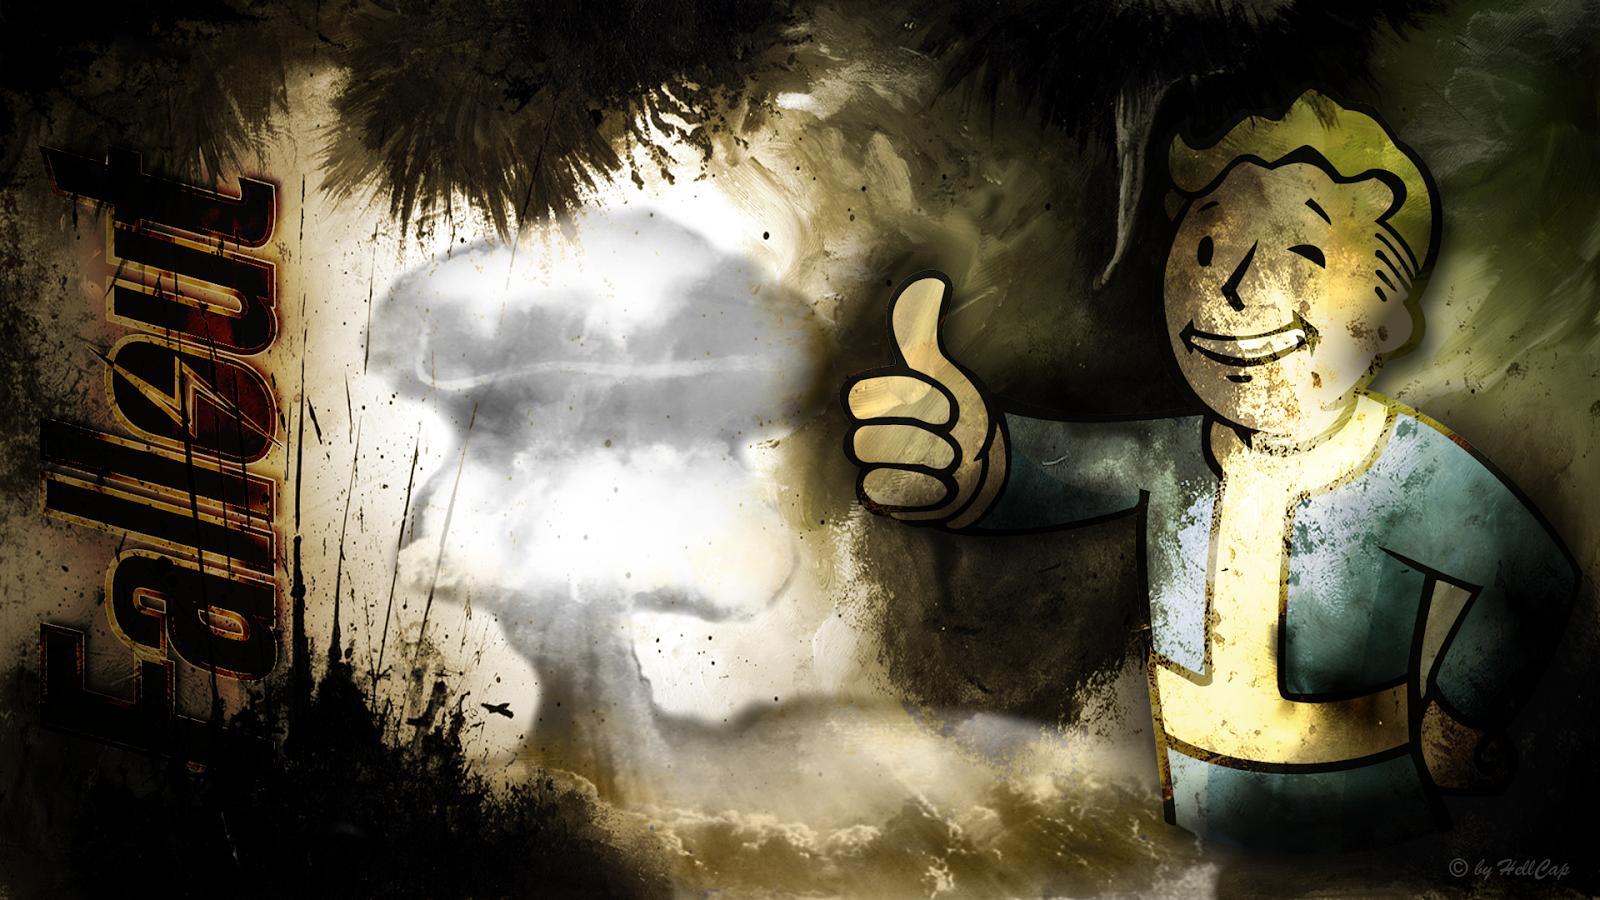 AllOut FallOut Fallout Vault Boy Wallpaper by Netbase 1920 x 1080 1600x900